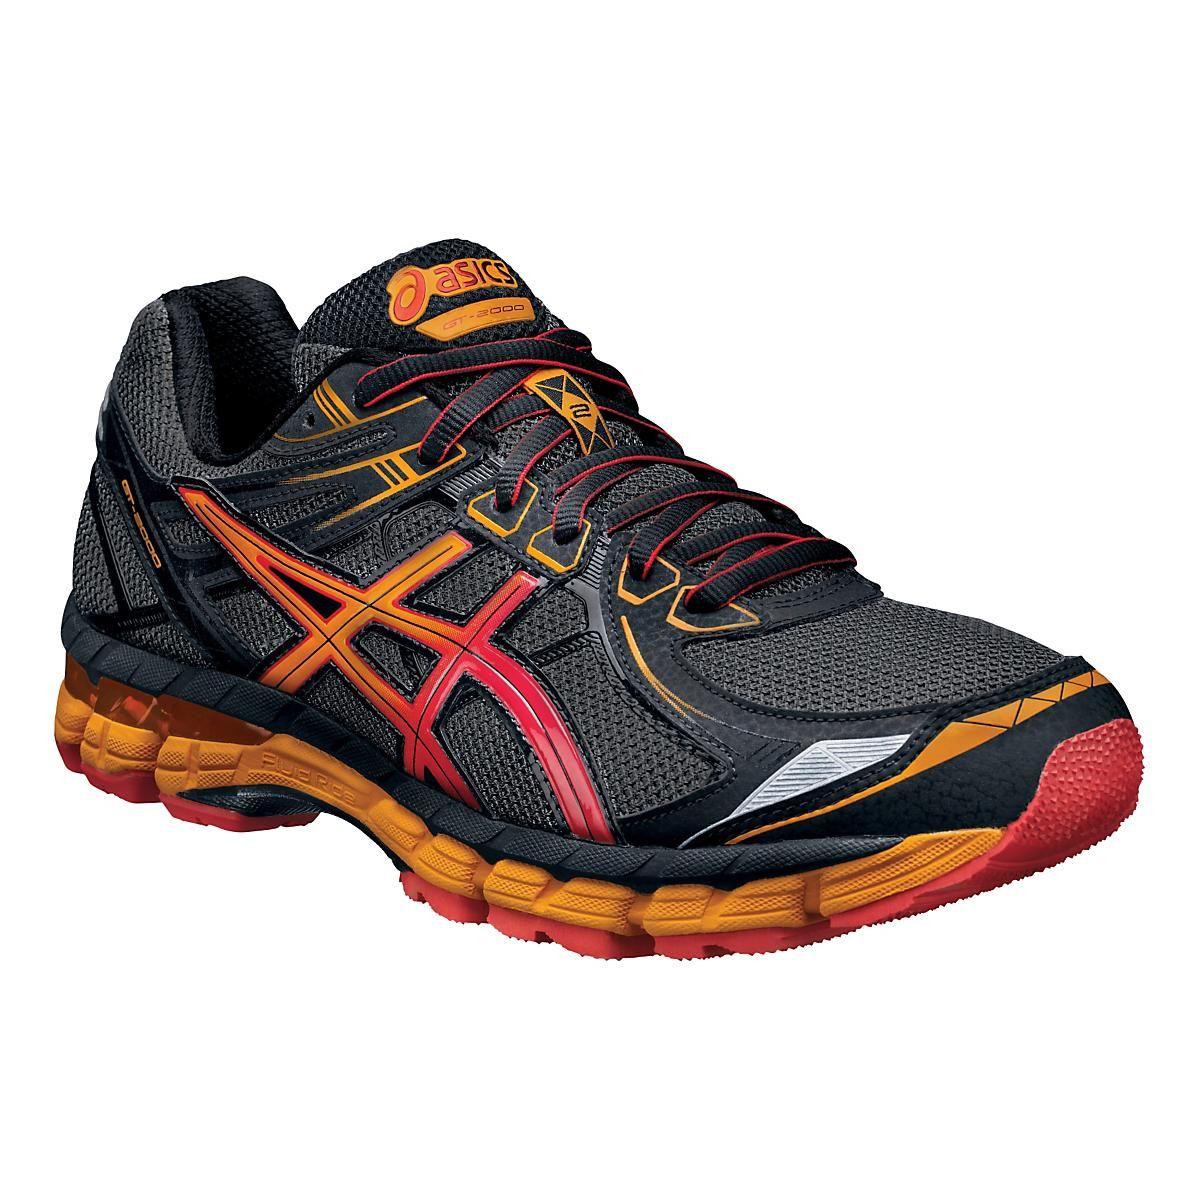 GT 17303 2000 2 2 Trail | 3e4e426 - canadian-onlinepharmacy.website